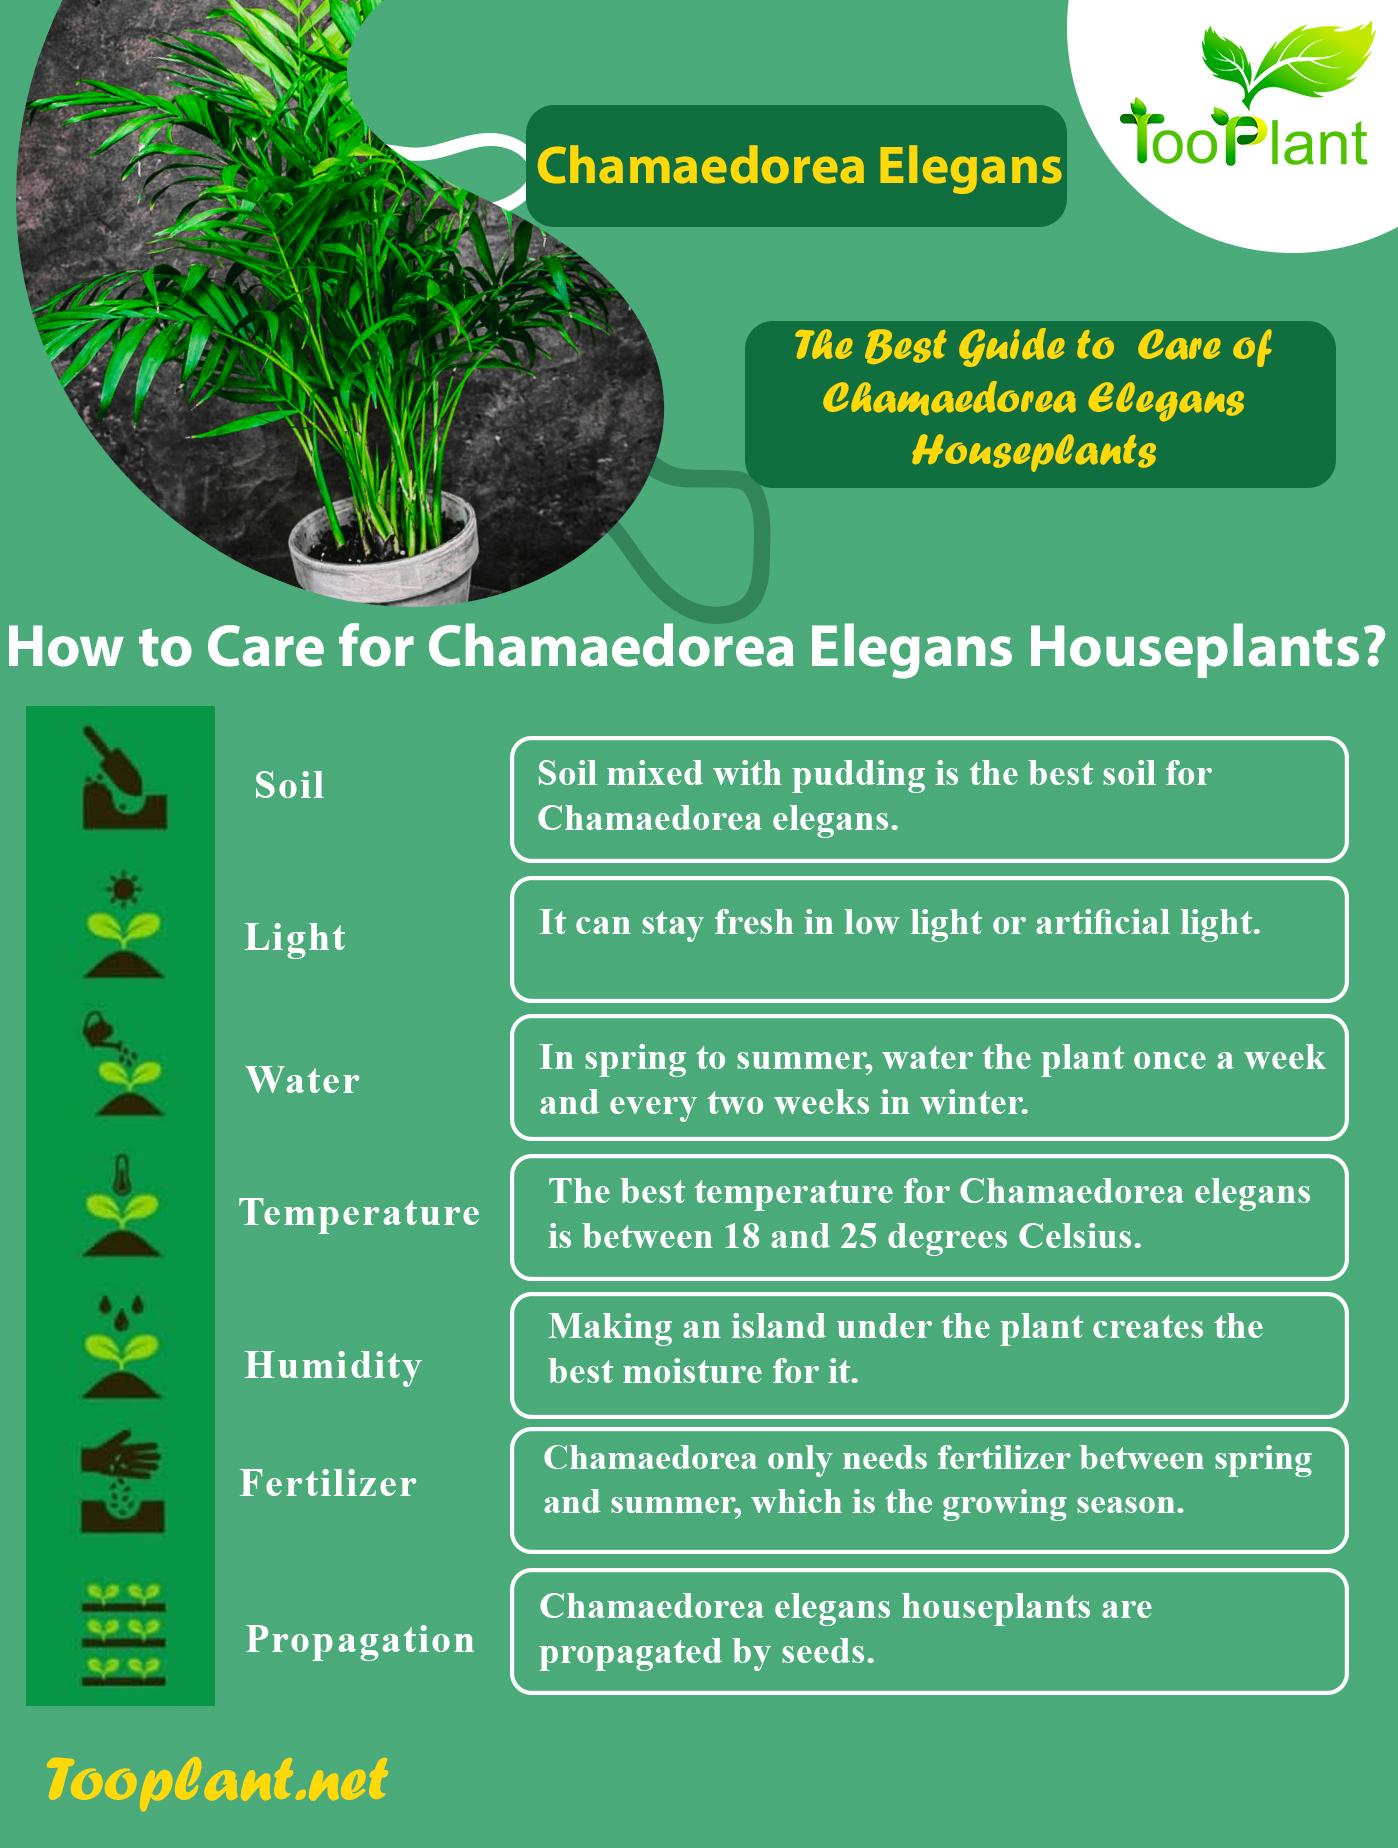 Infographic of Care for Chamaedorea Elegans Houseplants